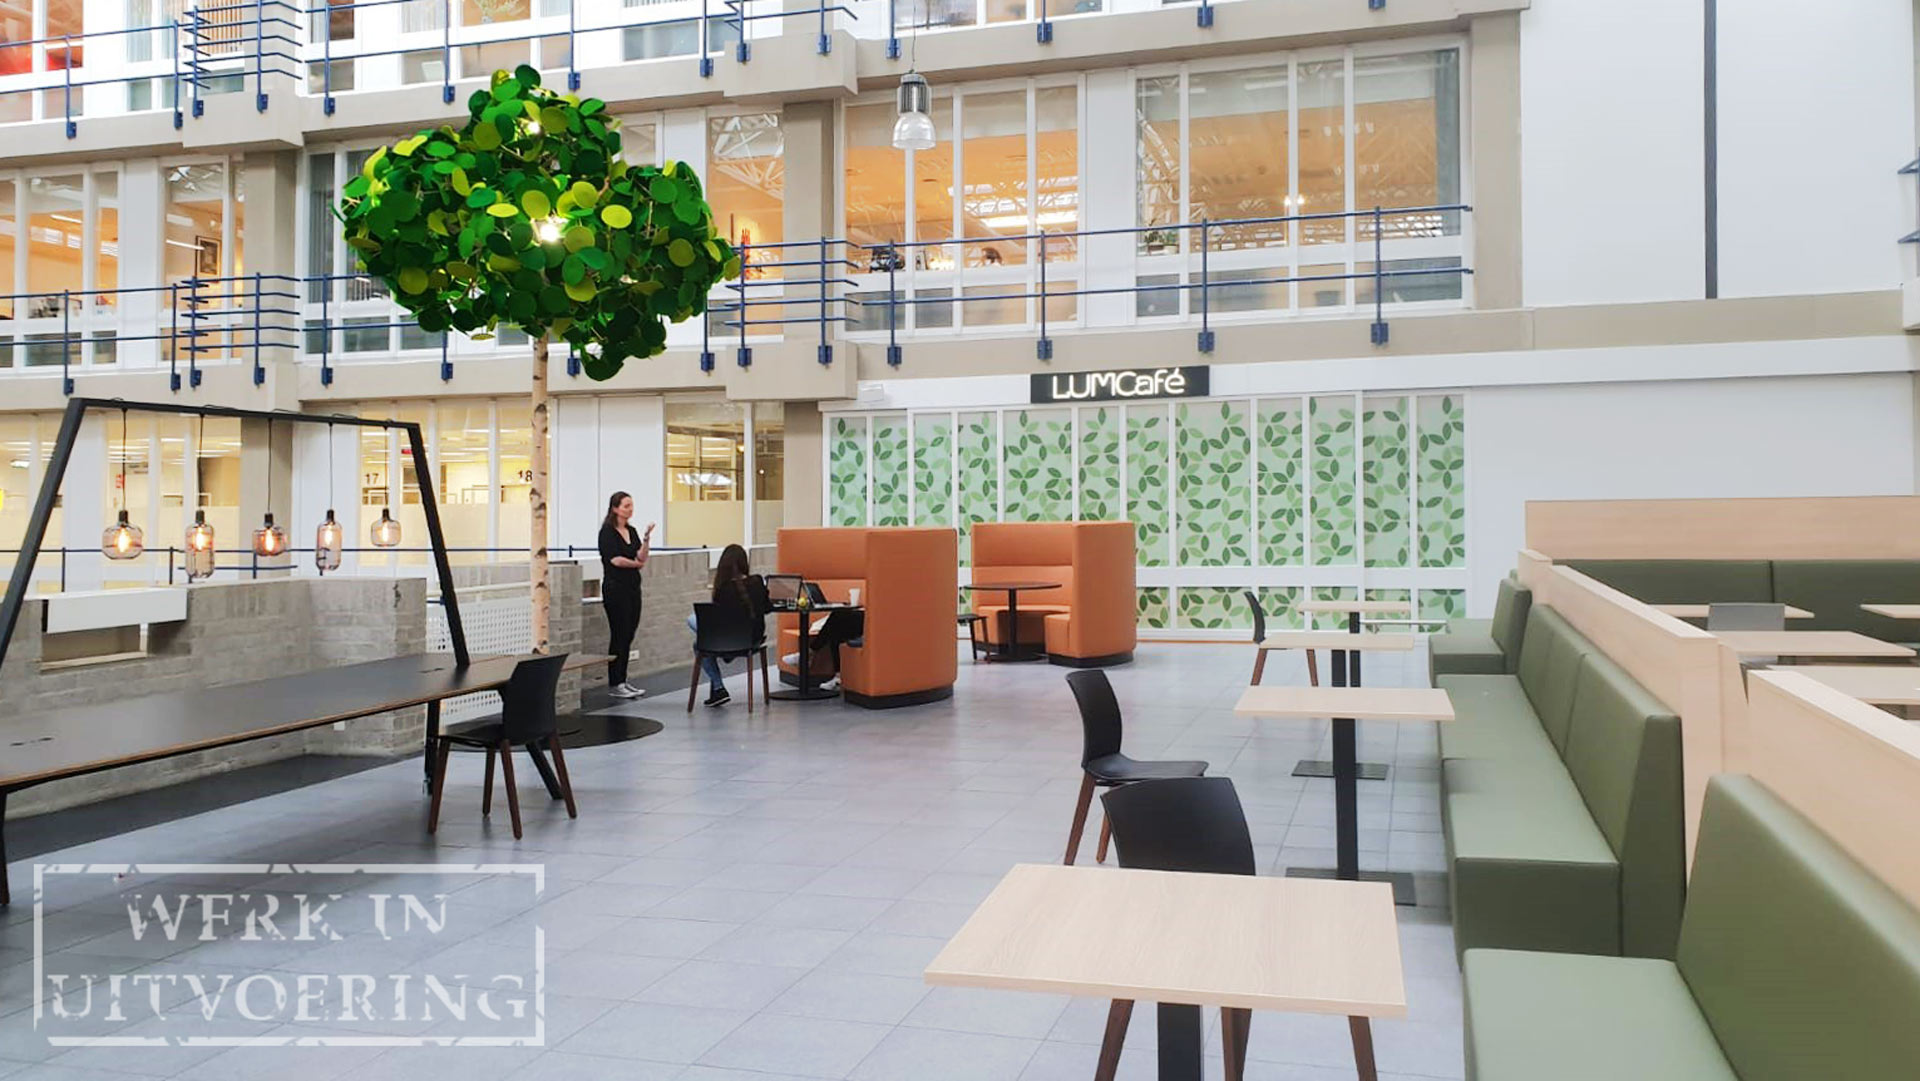 NewJoy-concepts-reastaurant-Leidse-Plein-LUMC-Leiden